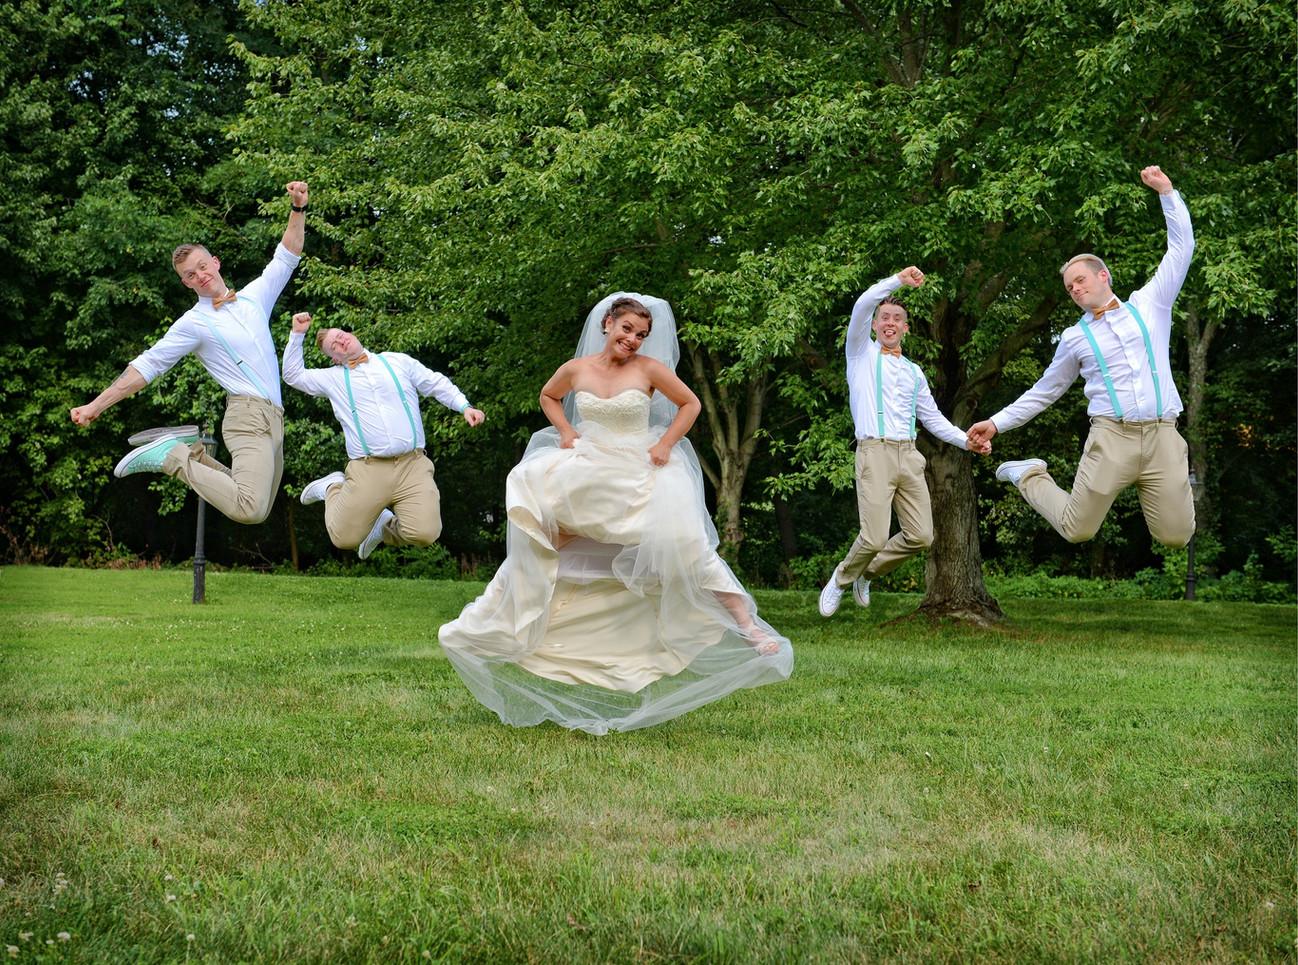 Nicole+&+Brian+Wedding+-+8074+jump.jpg